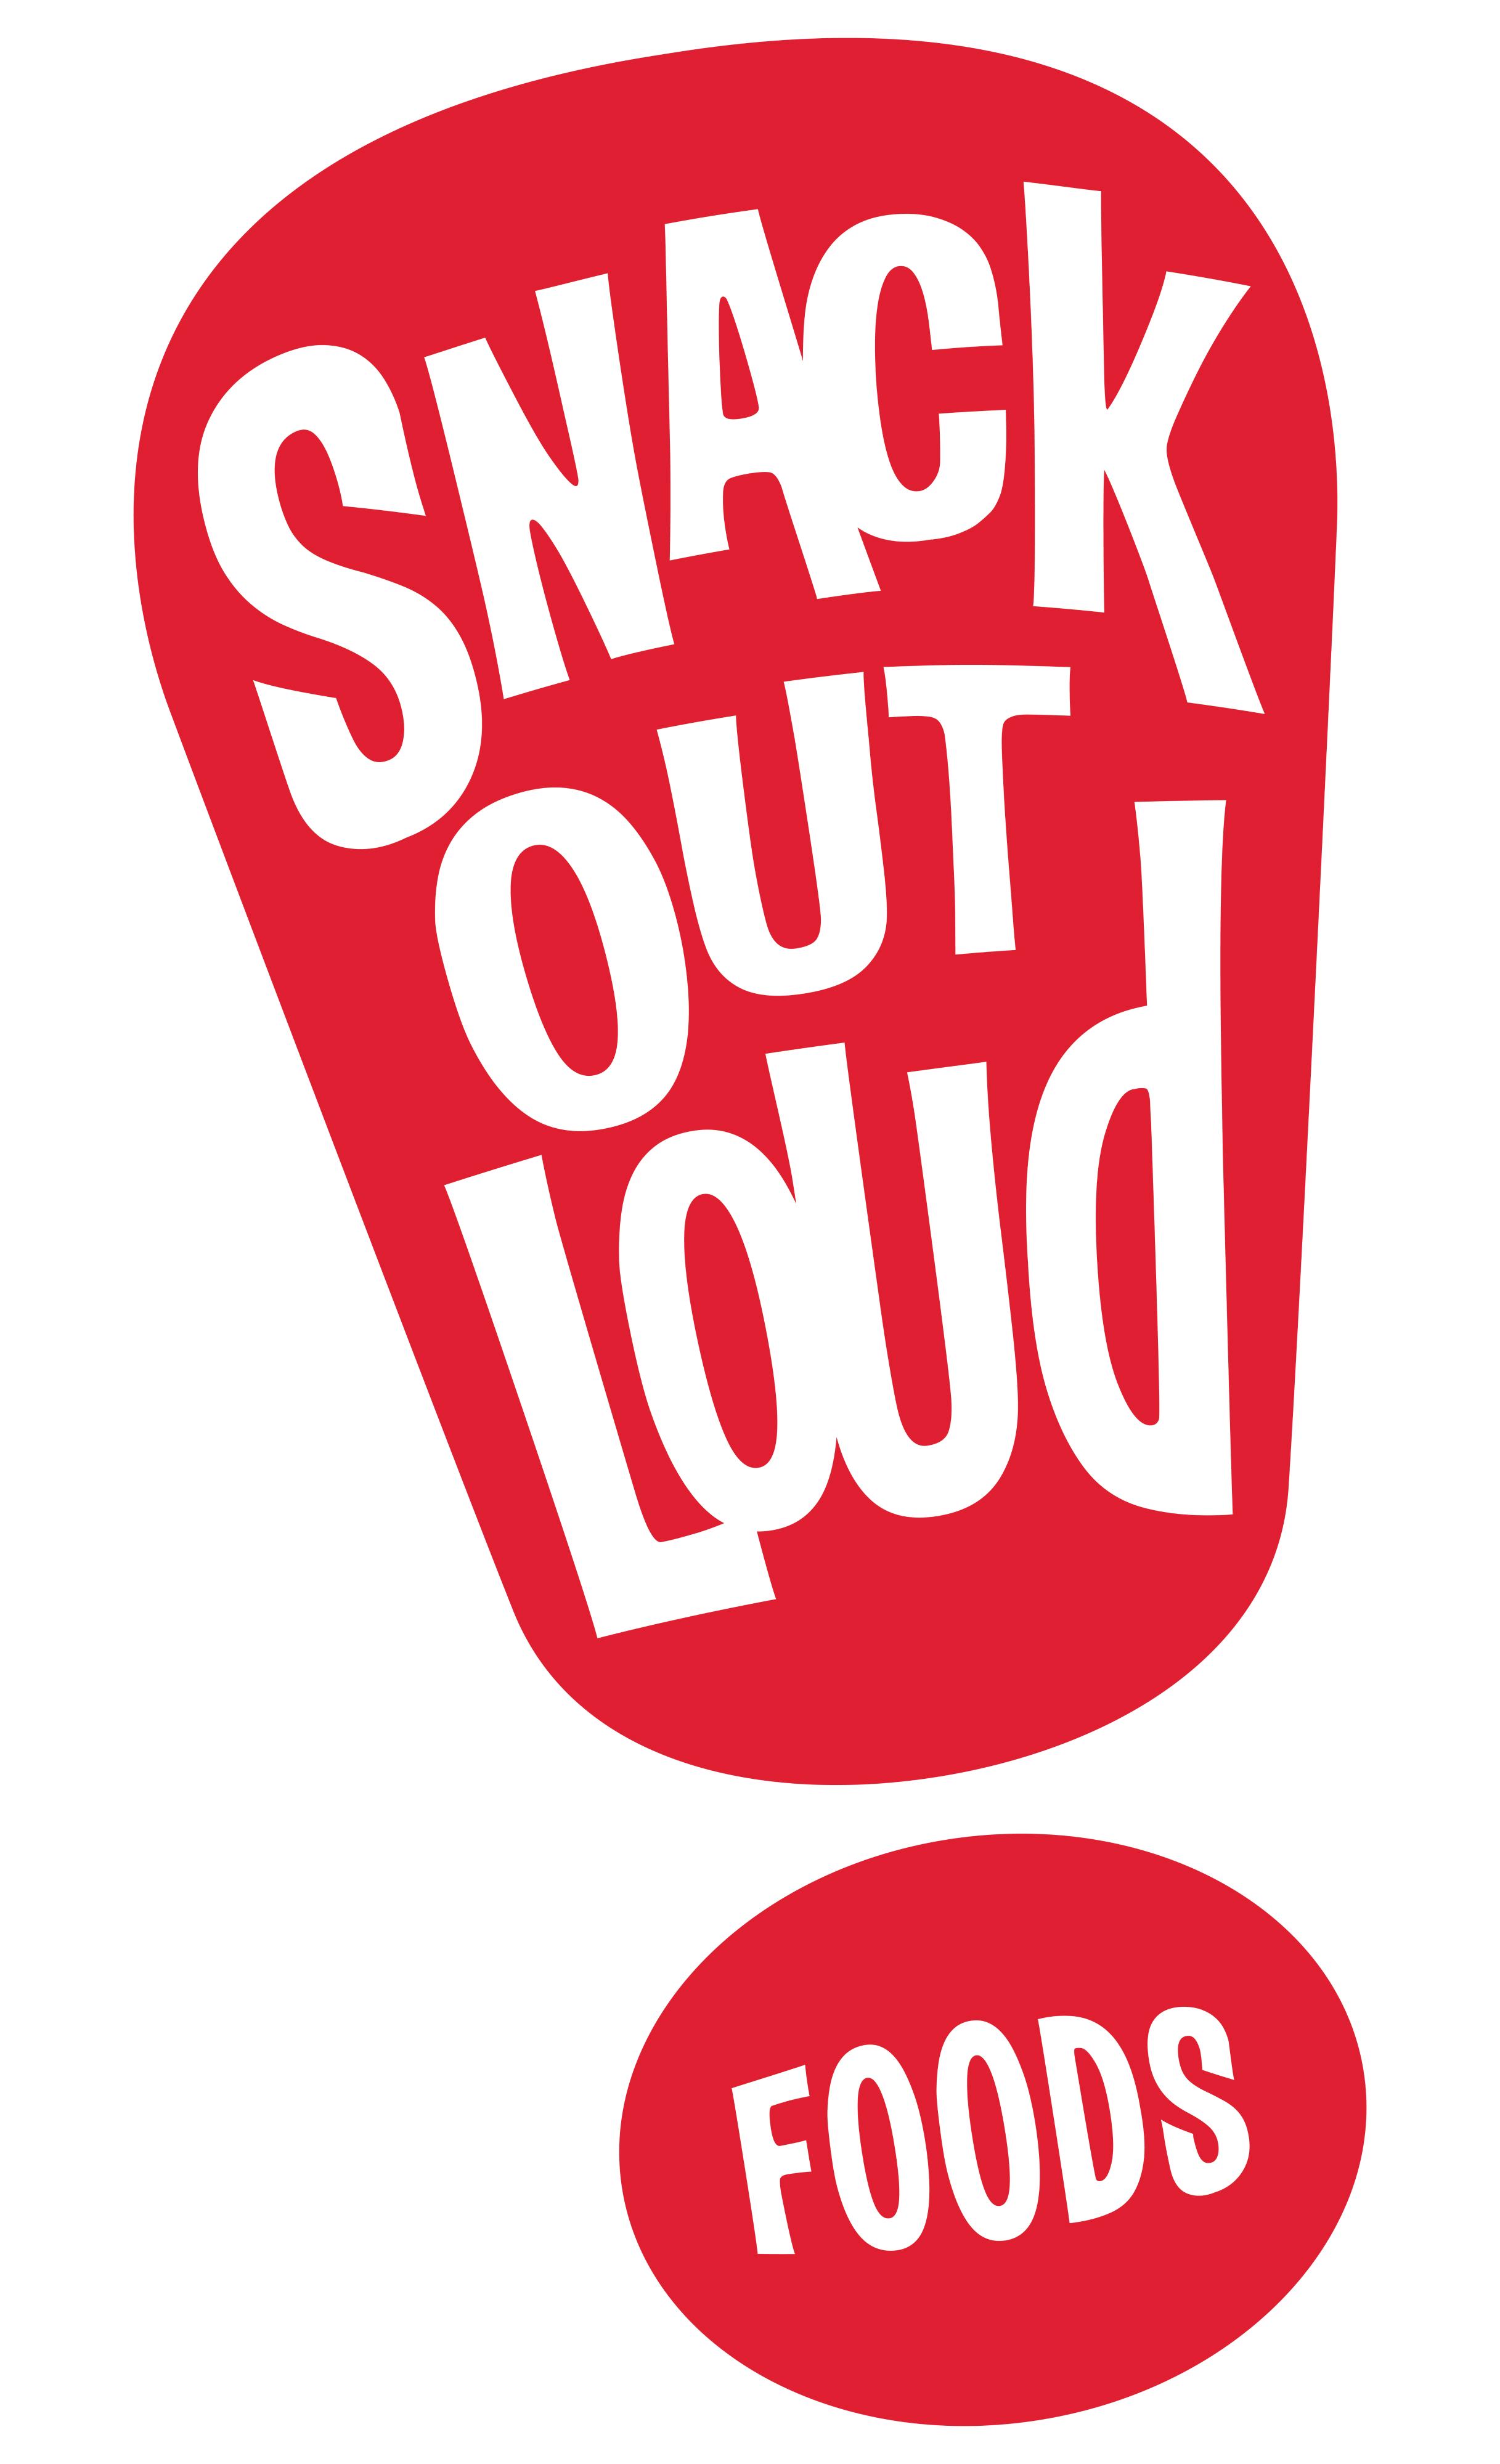 Snack_Out_Loud_logo.jpg